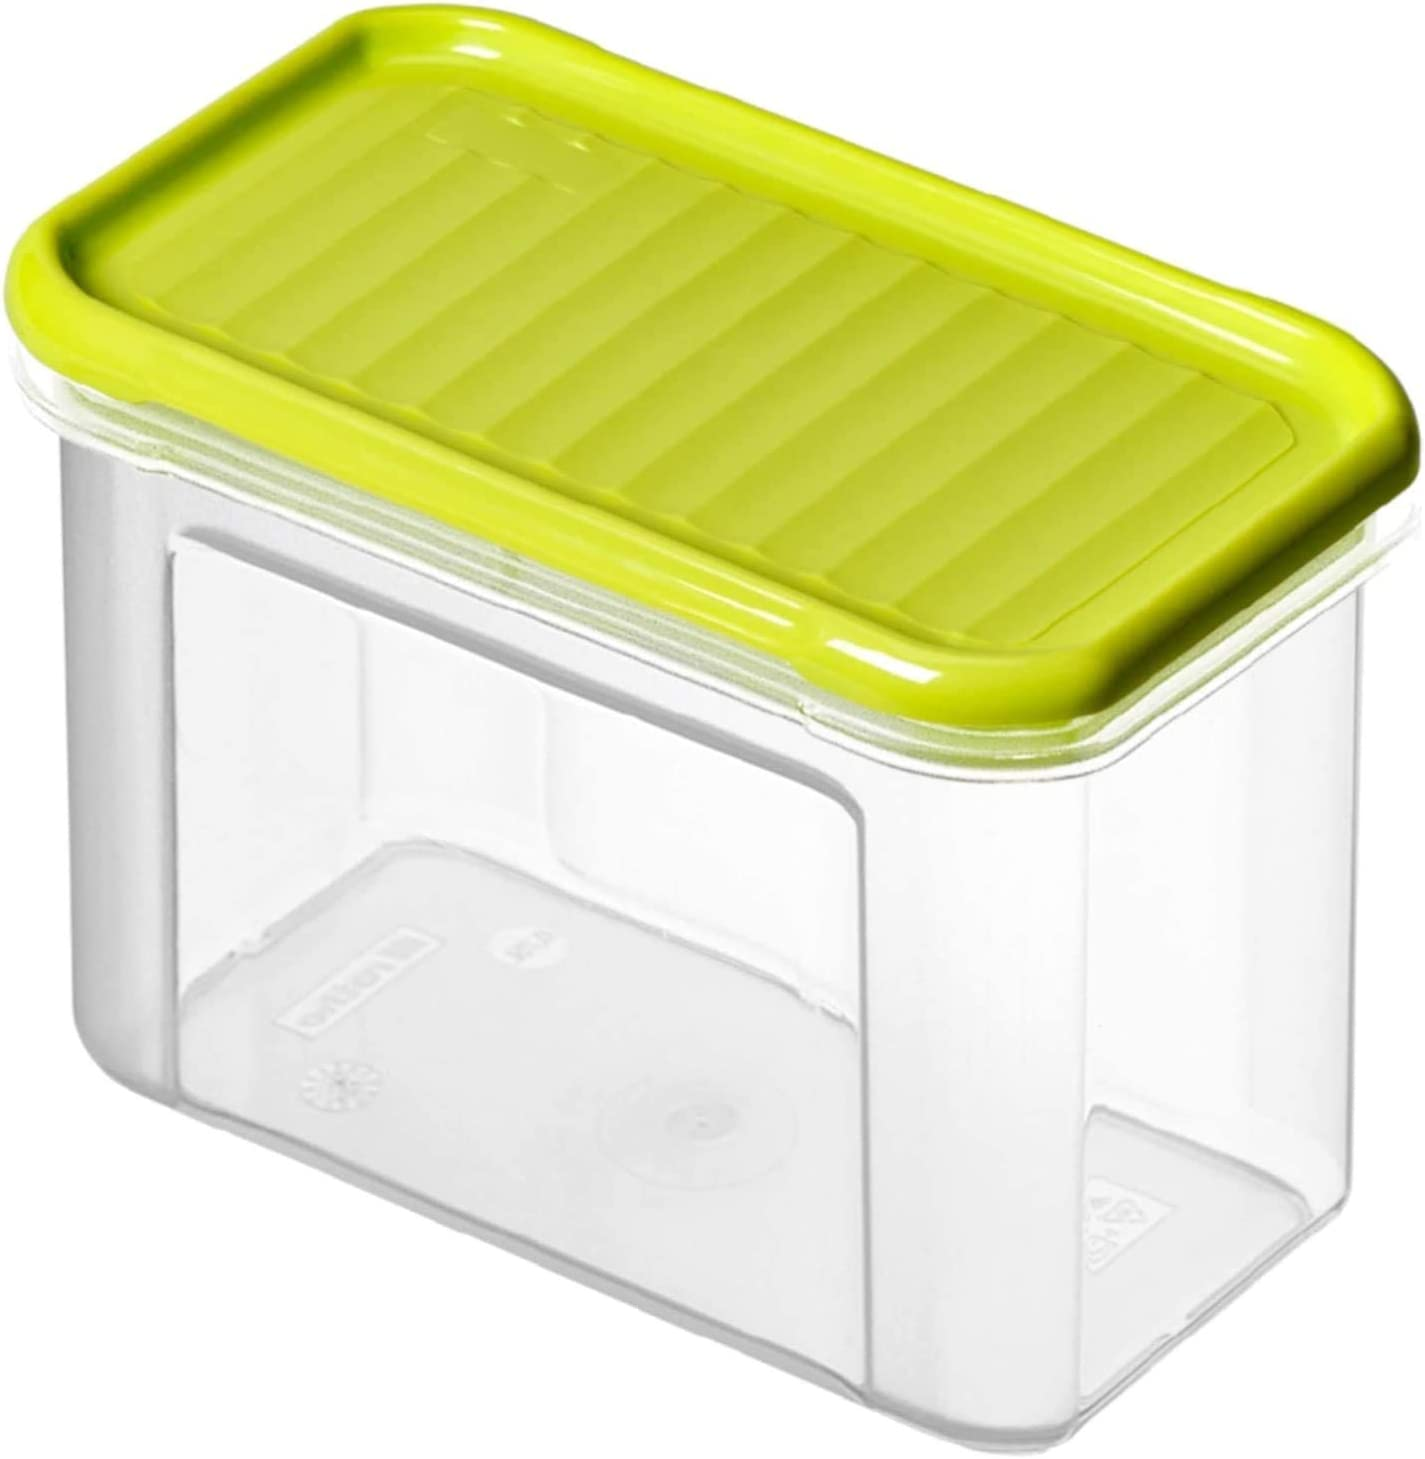 Rotho Domino Vorratsdose 0,75l mit Deckel, Kunststoff (PP) BPA frei, transparentgrün, 0,75l (16,5 x 9,0 x 10,0 cm)